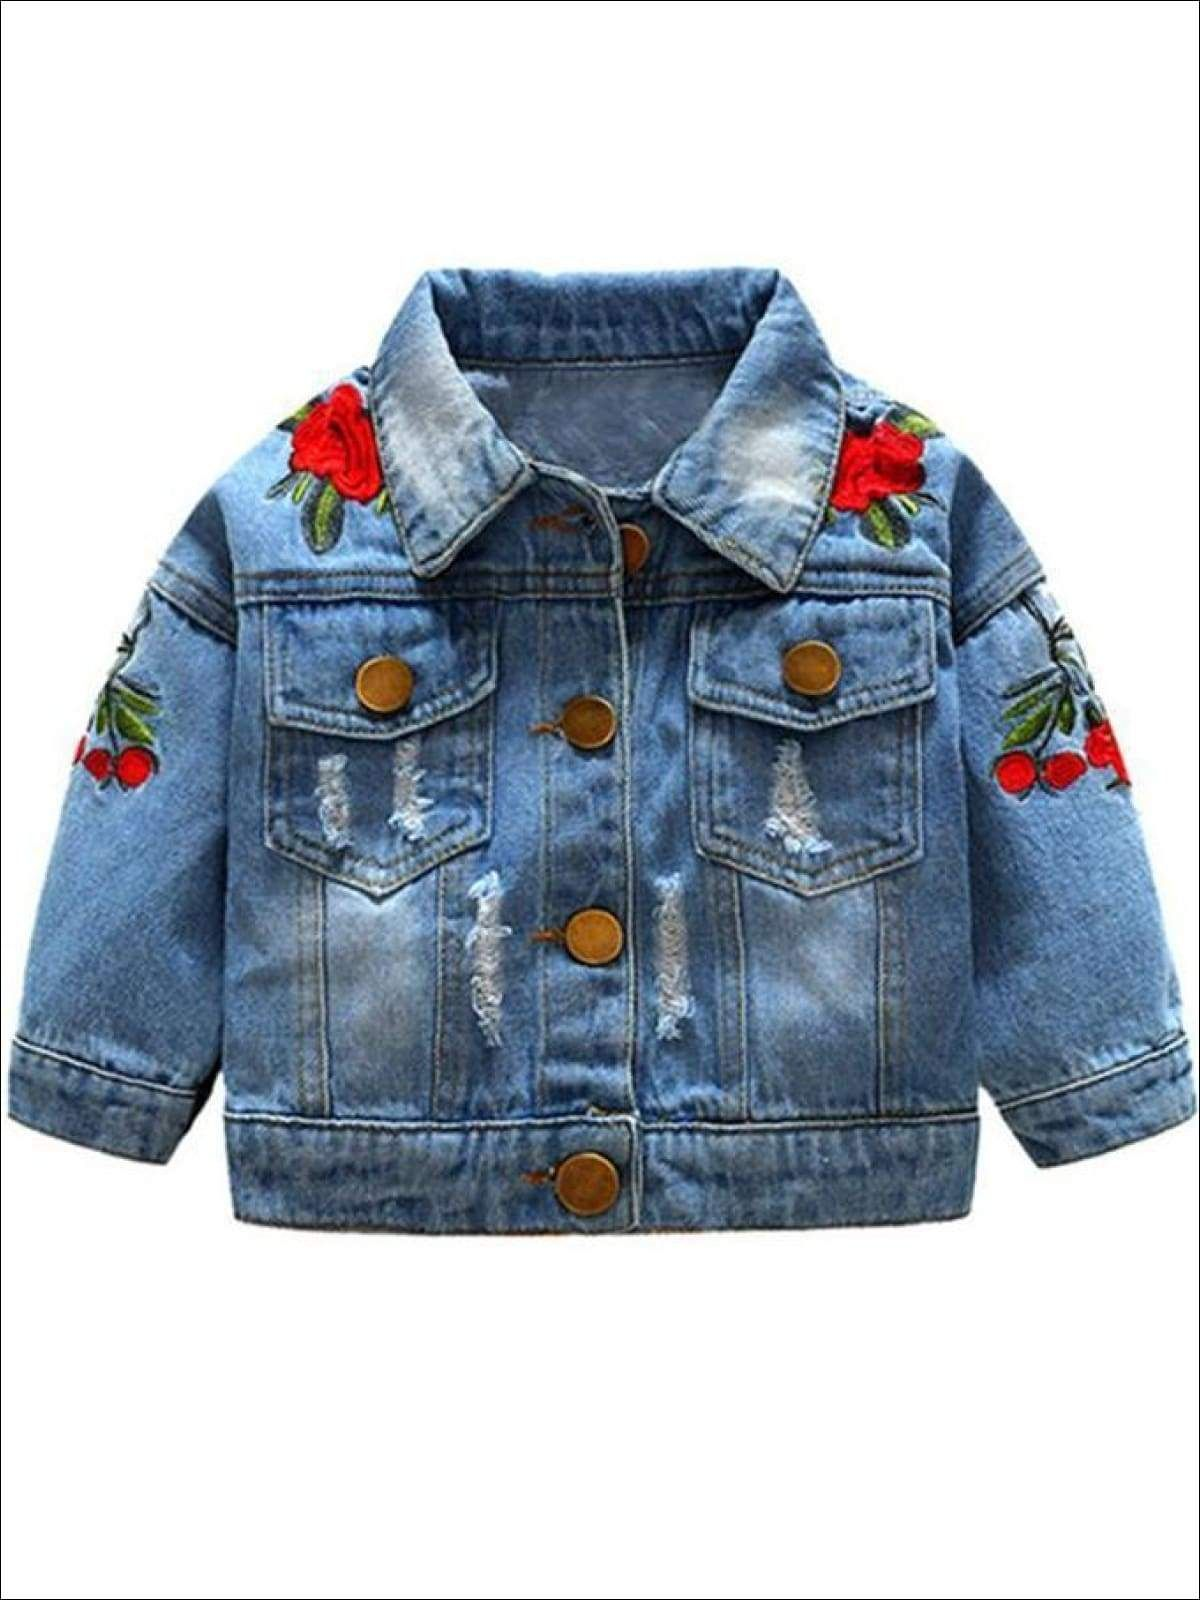 Girls Distressed Denim Jacket With Rose Embroidery In 2020 Girls Denim Jacket Baby Denim Jacket Vintage Denim Jacket [ 1600 x 1200 Pixel ]